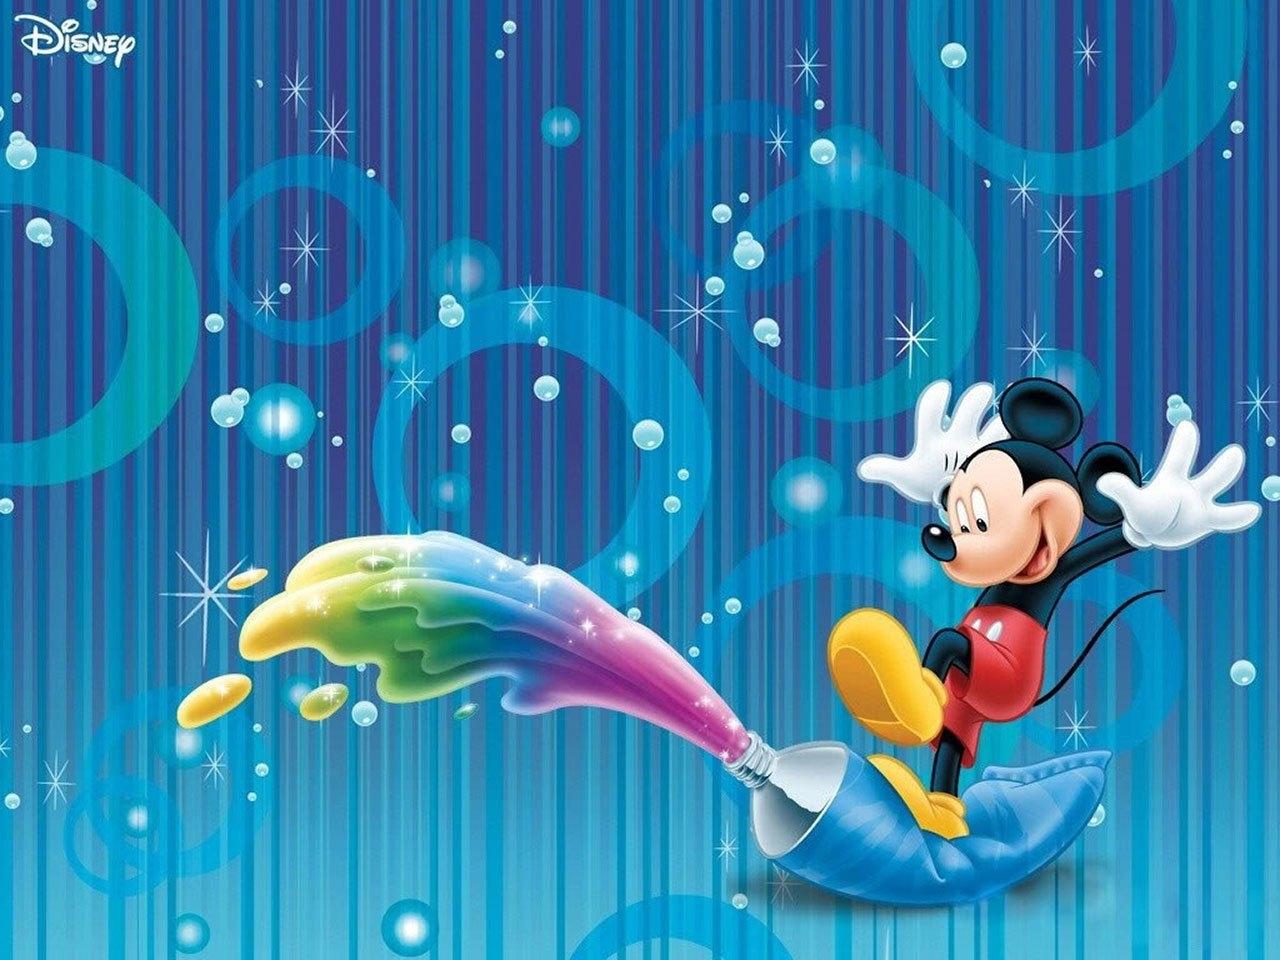 mickey mouse fond d'écran and arrière-plan | 1280x960 | id:481750